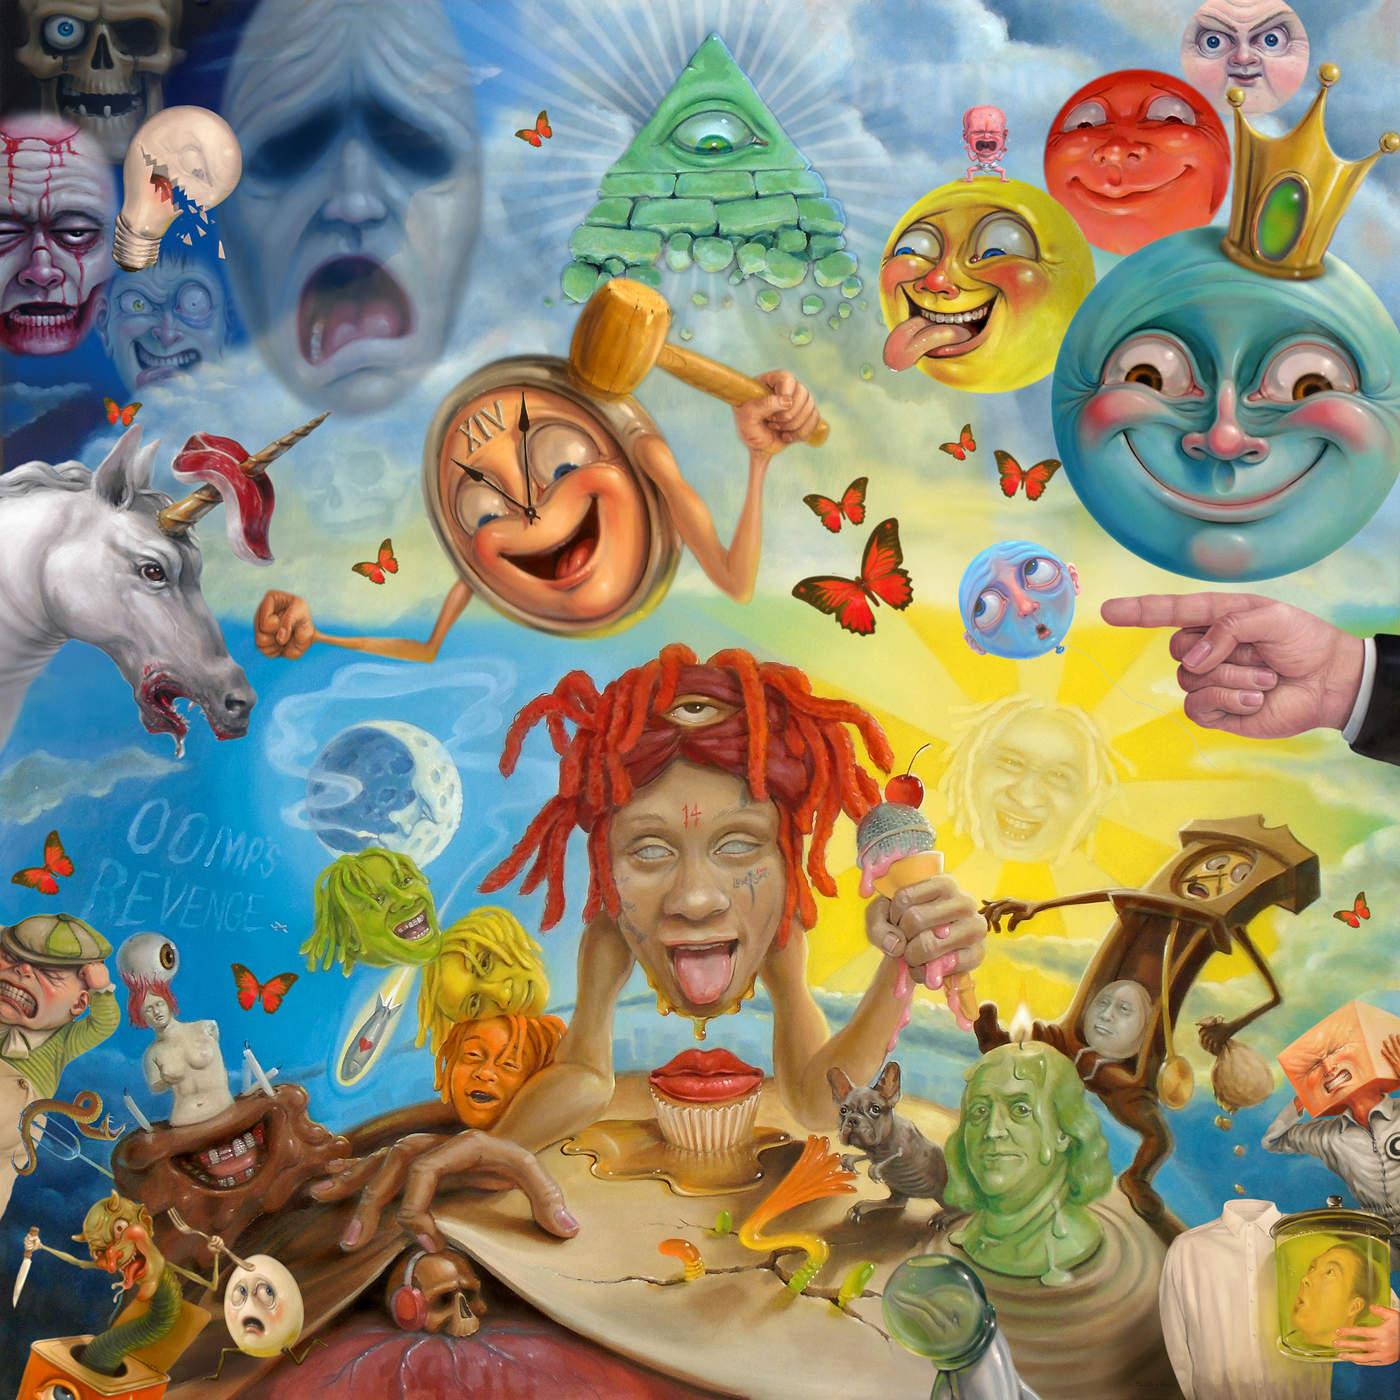 All Music by Trippie Redd